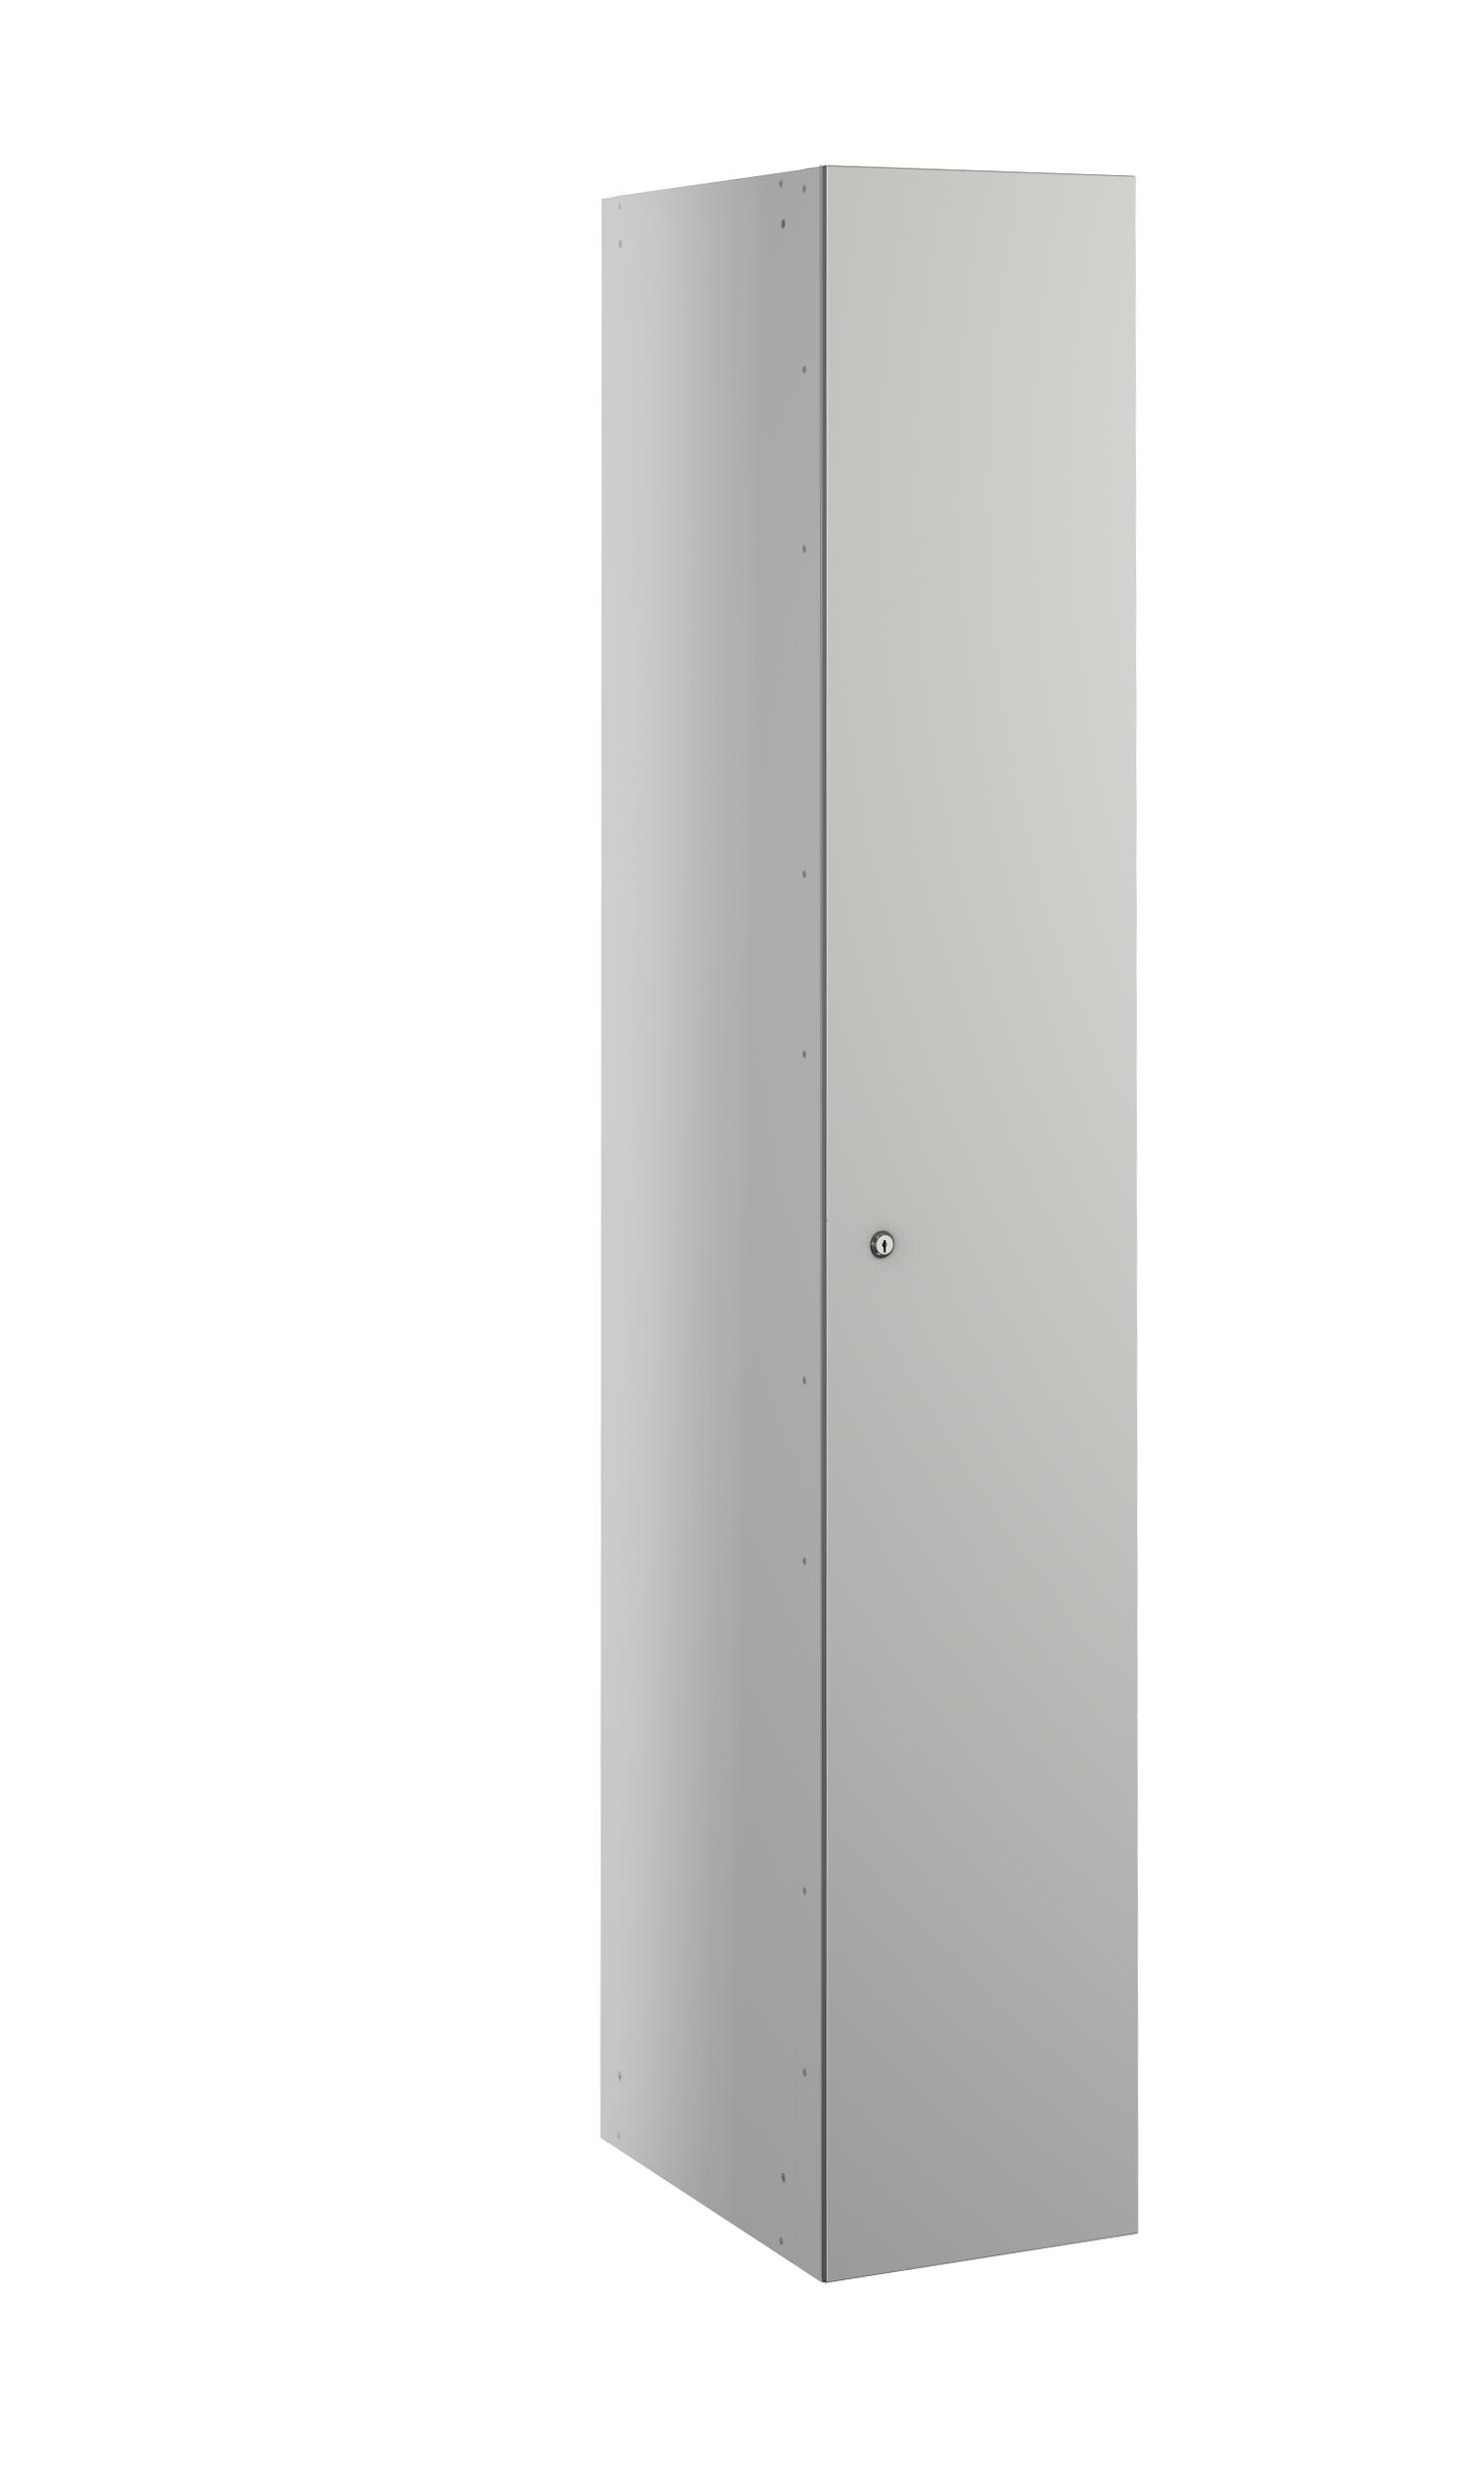 Probe buzzbox laminate 1 door white